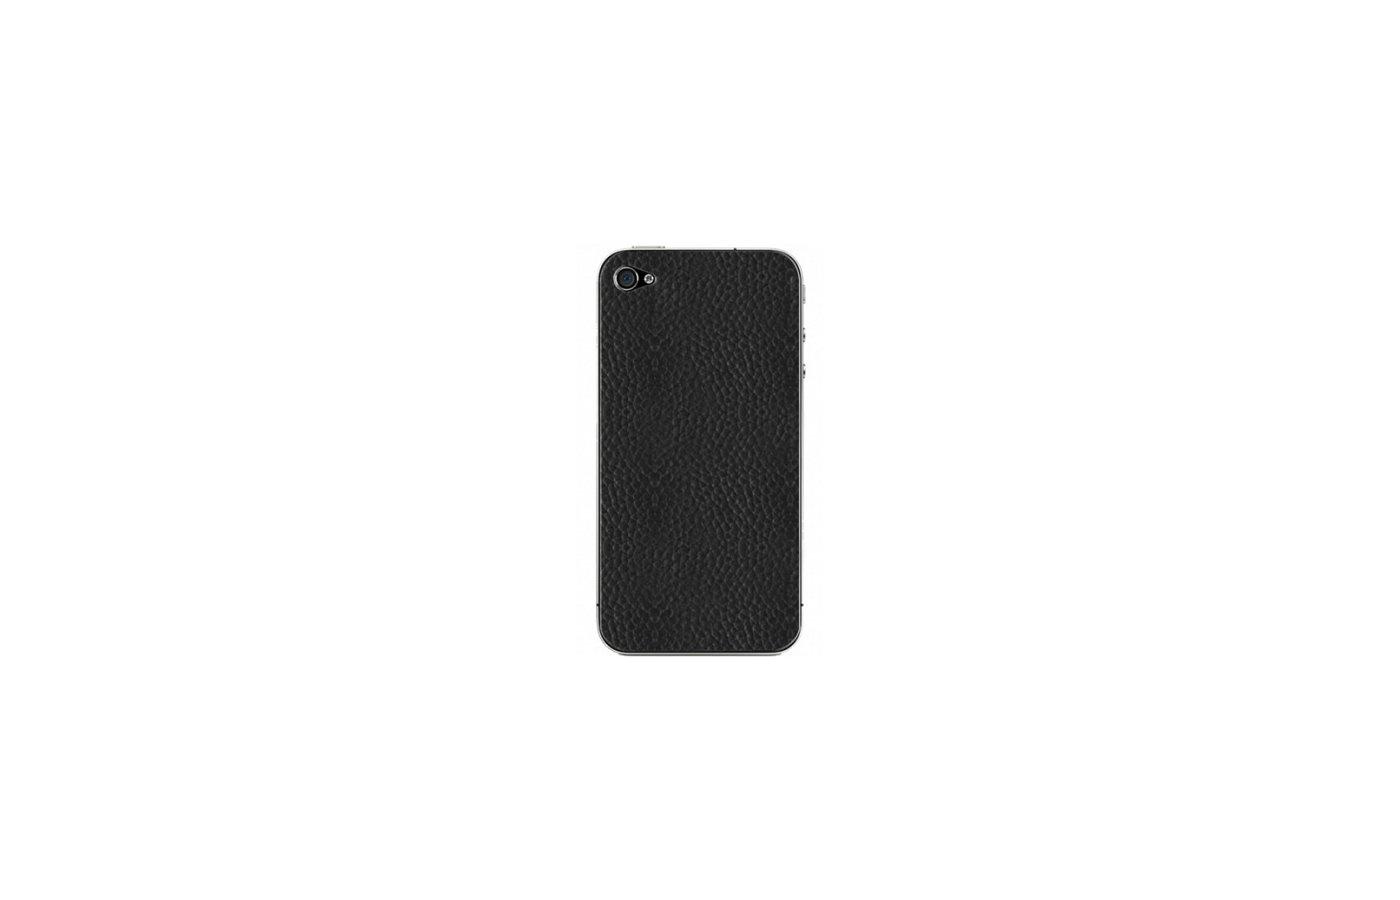 Стекло Clever Skinward для iPhone 4/4S черная